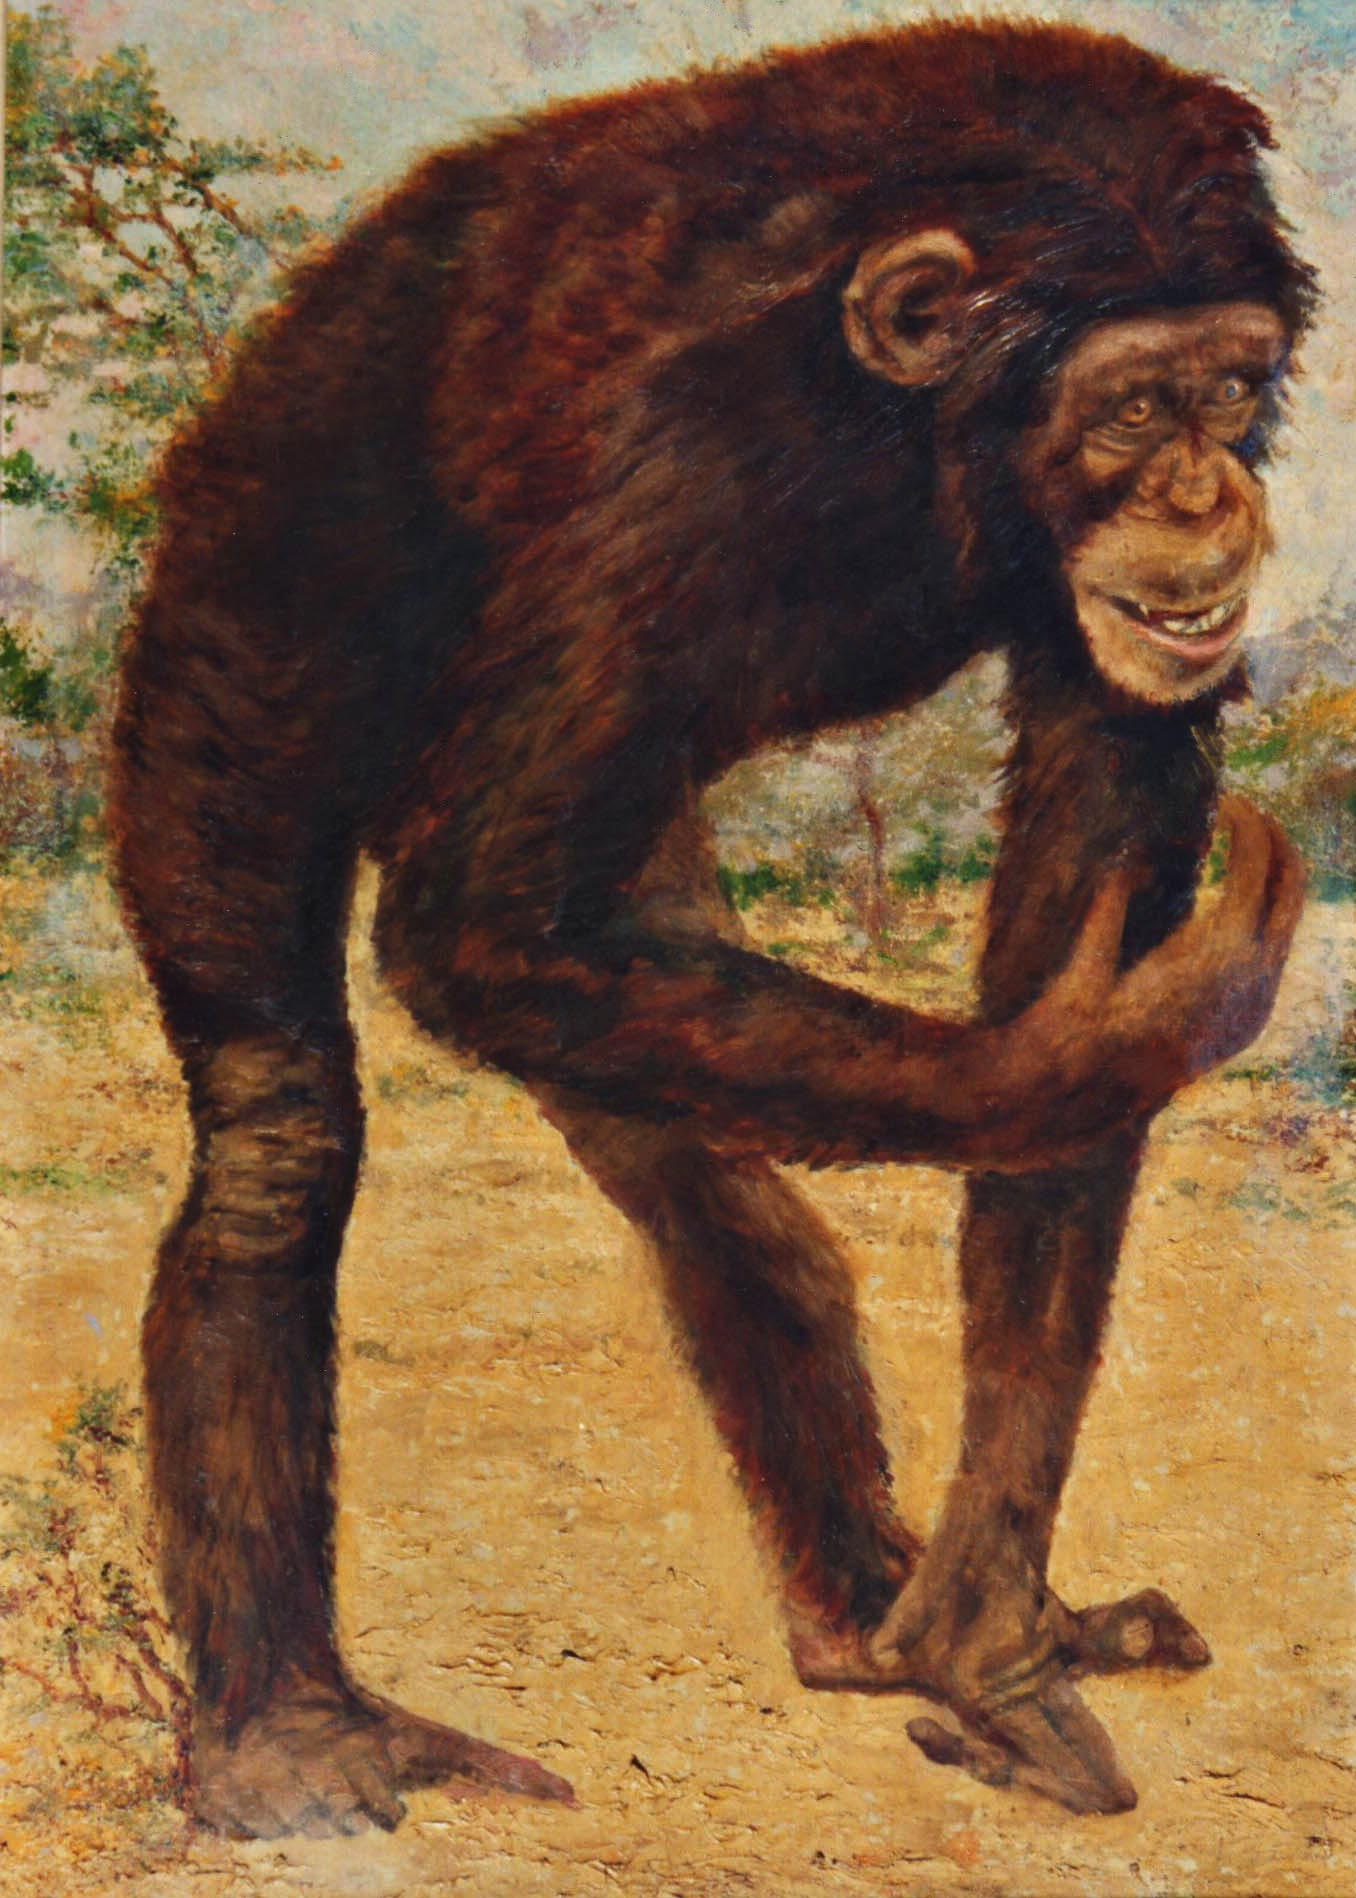 quadri africani animali scimpanzé olio su faesite Sabbatino